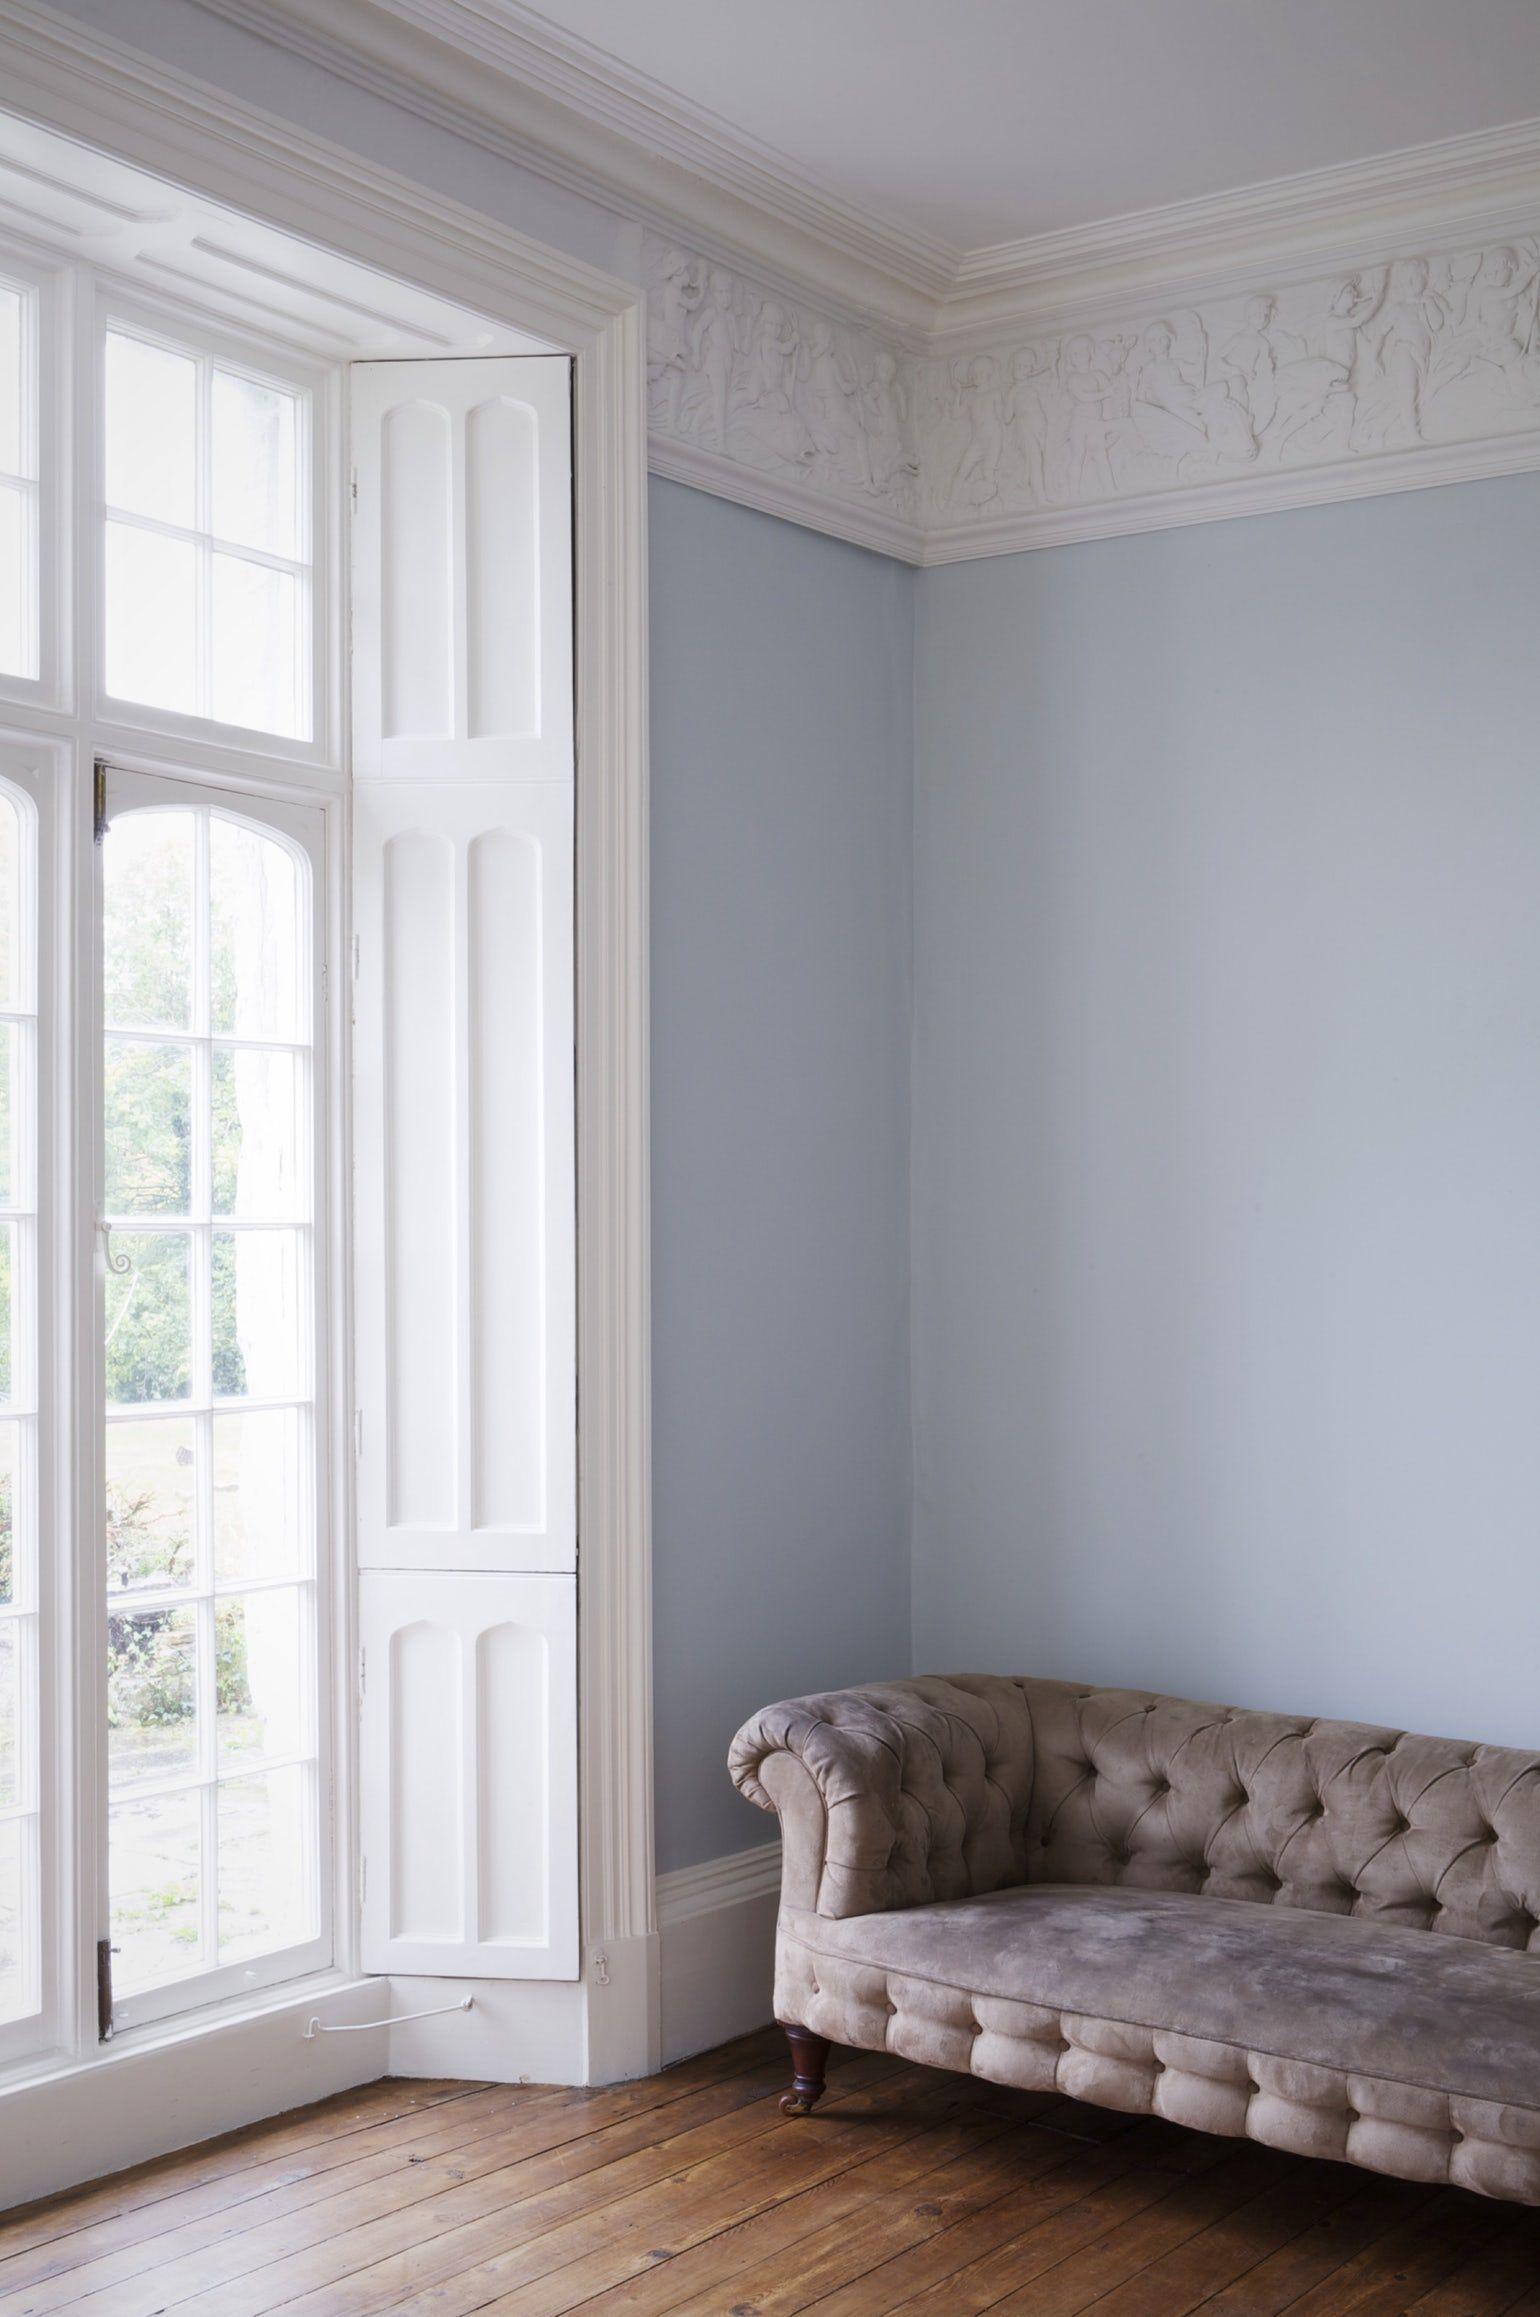 Best Skylight No 205 Skylight Living Room Farrow And Ball 640 x 480